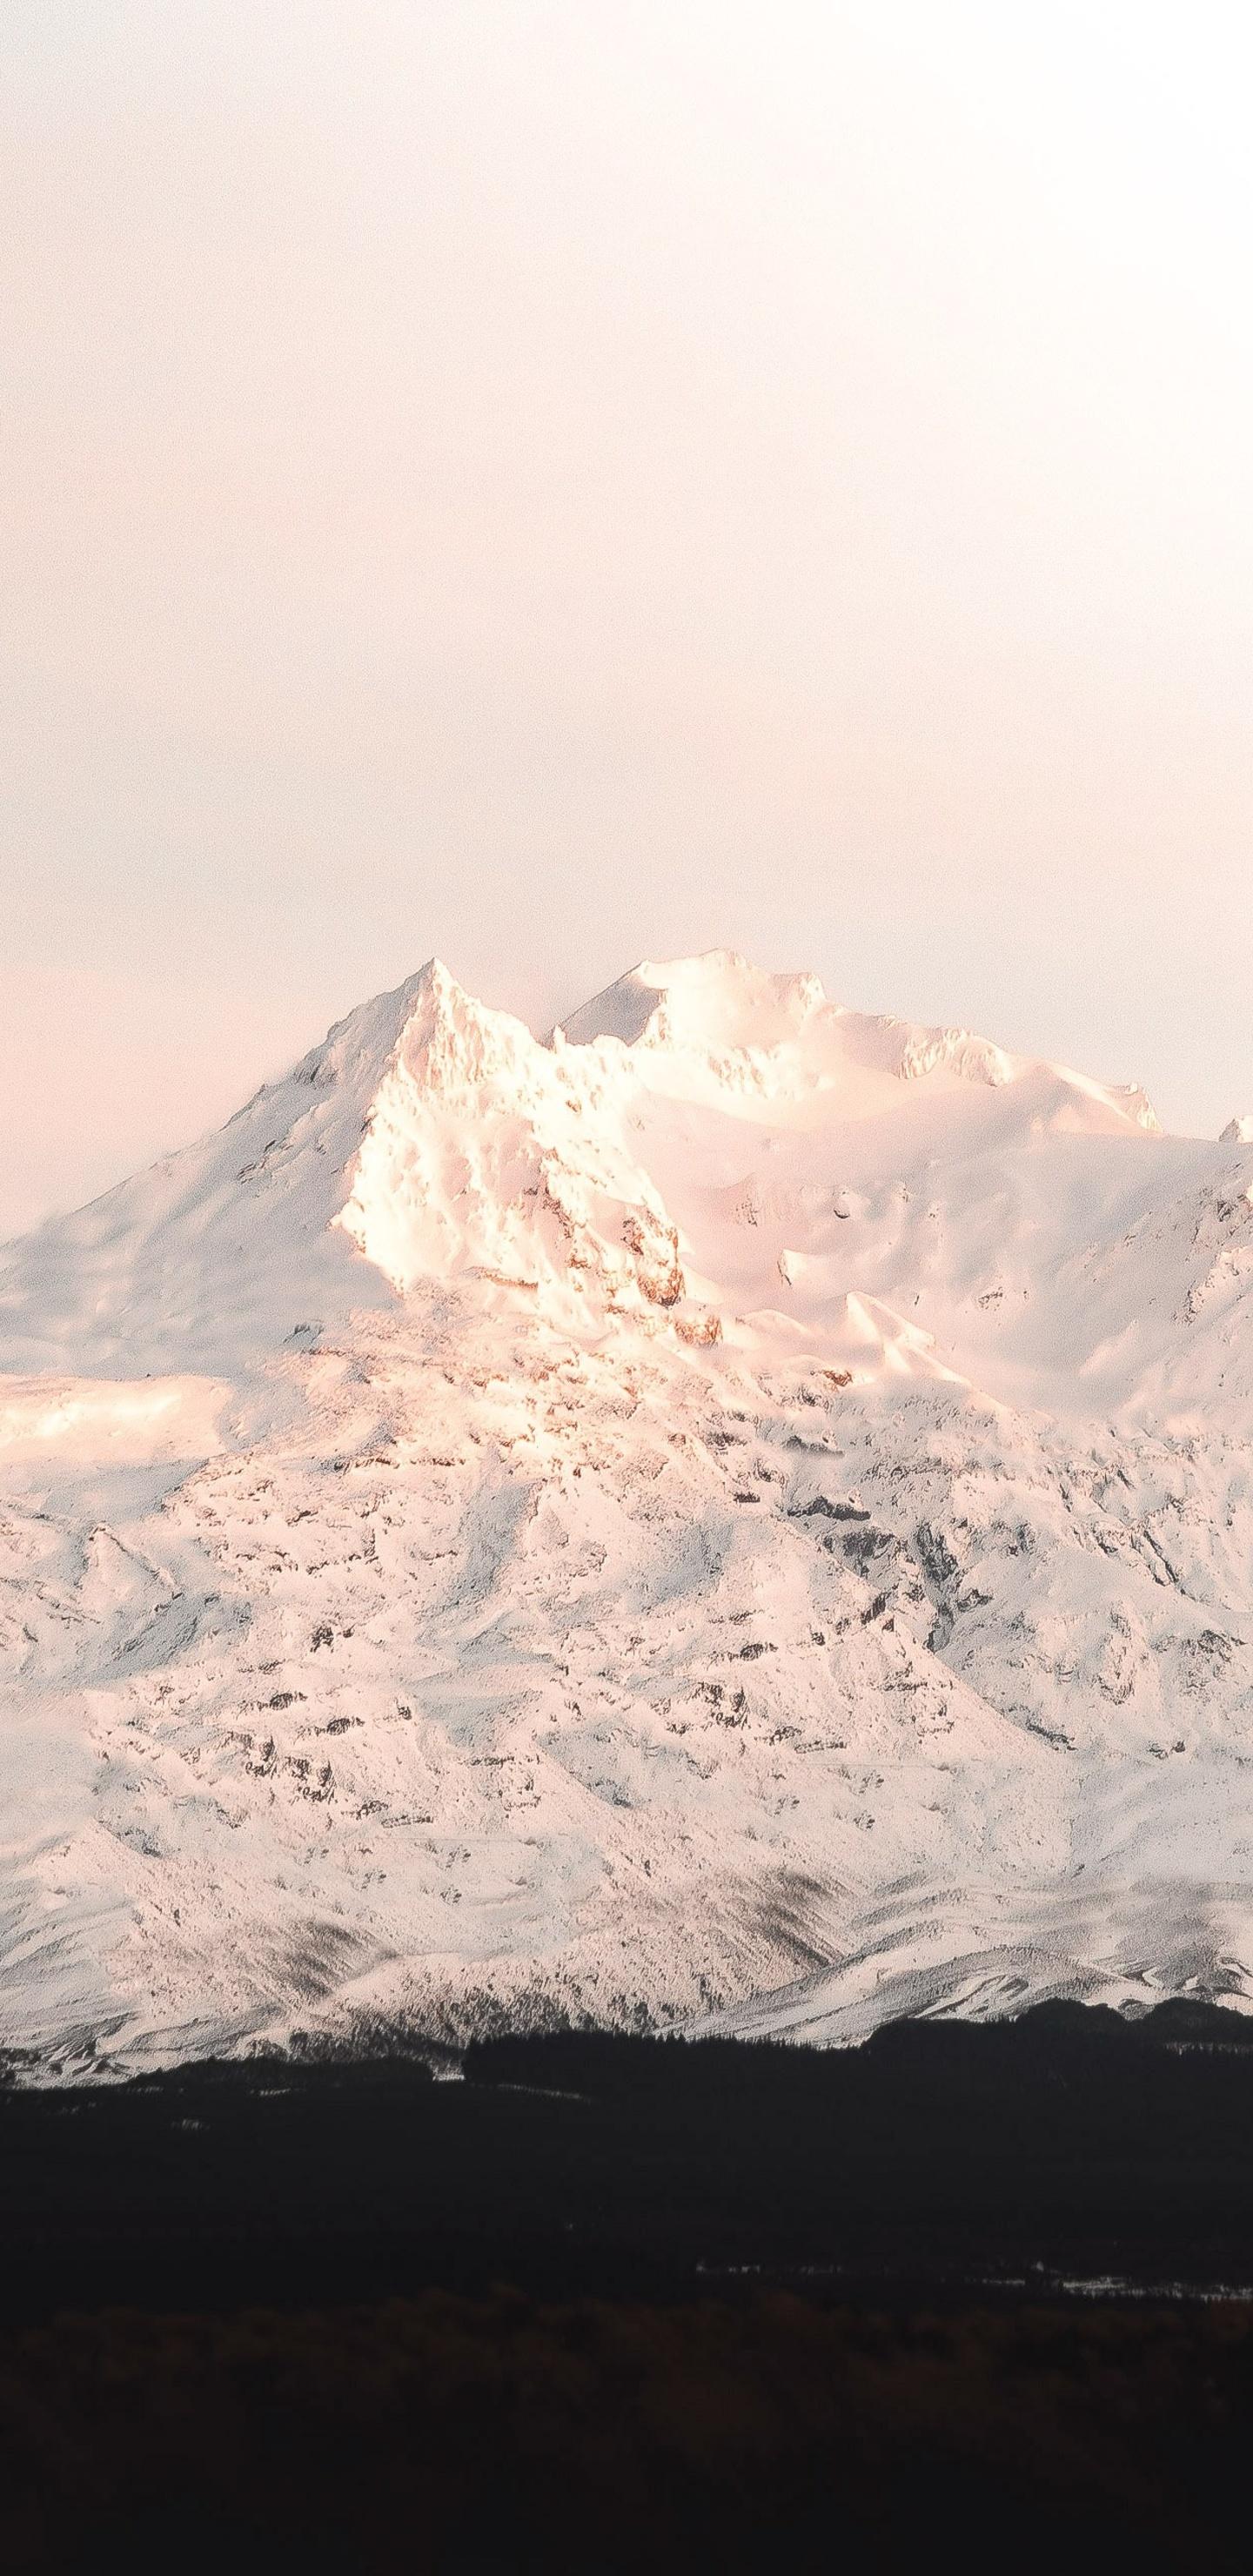 mount-ruapehu-covered-in-snow-4k-of.jpg